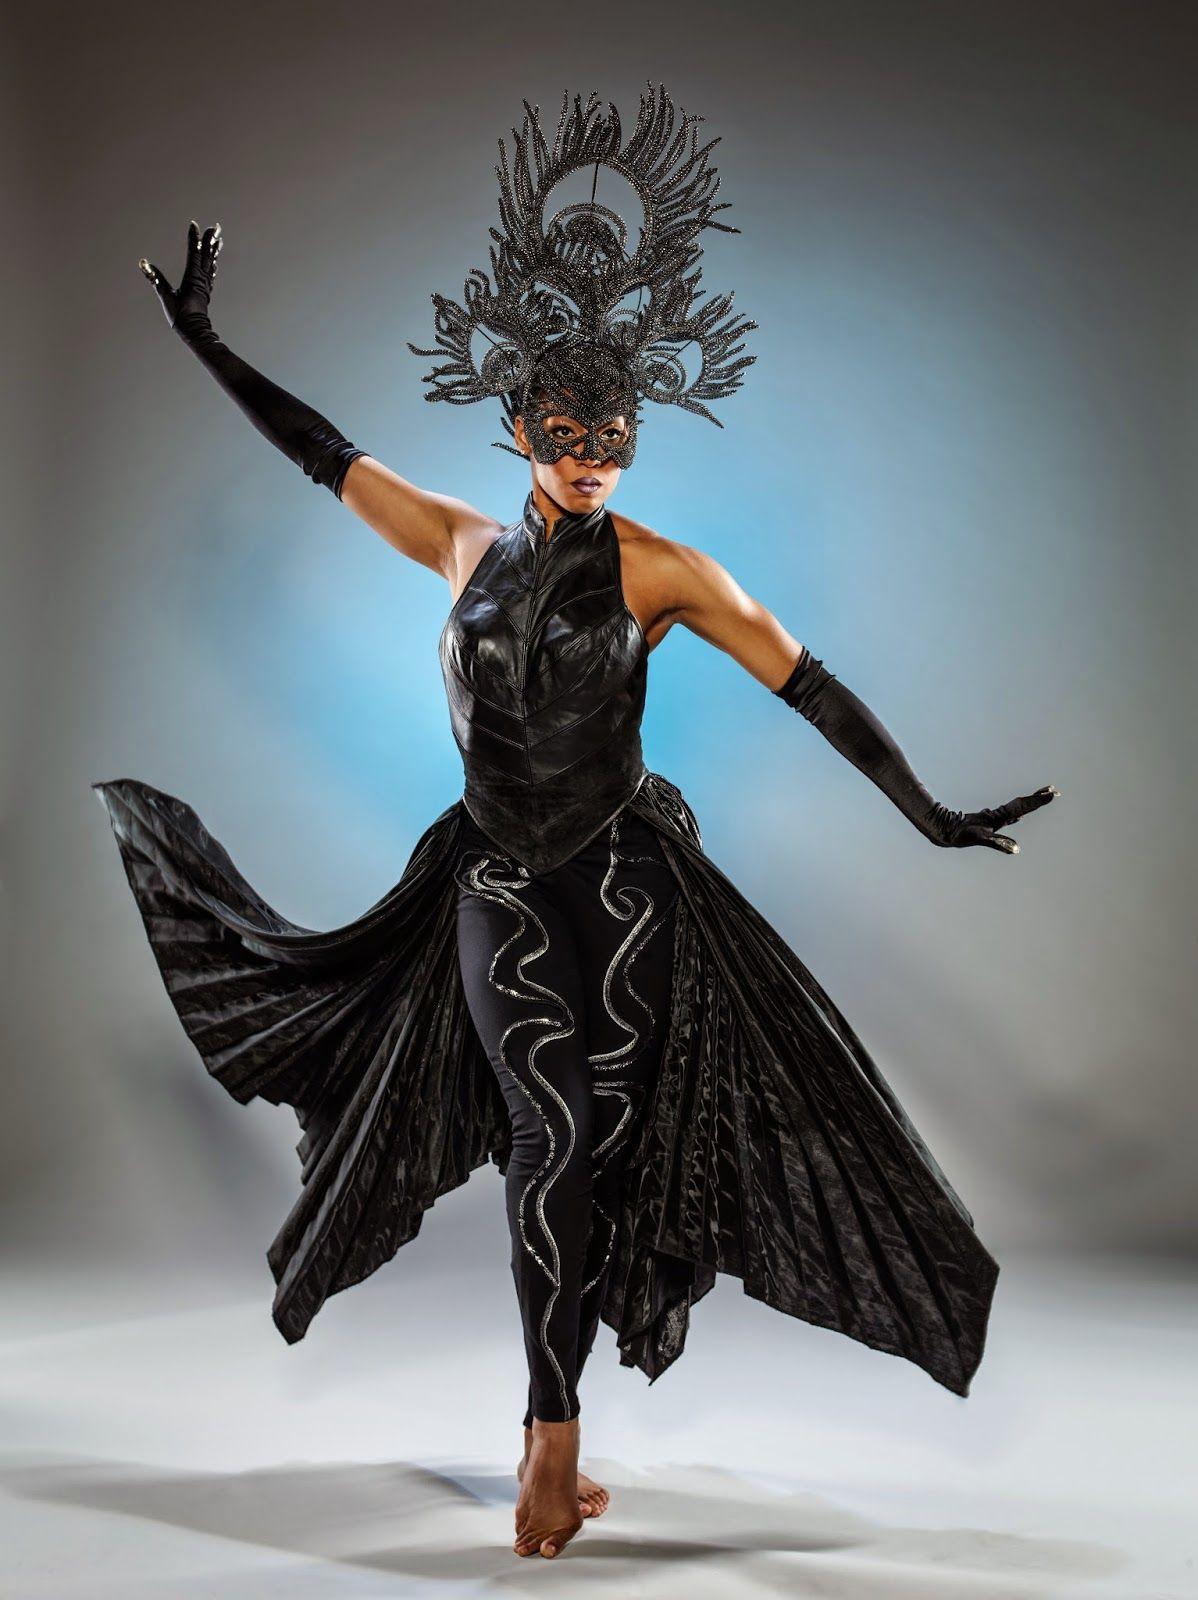 Cirque du Soleil's Amaluna at the National Harbor Review